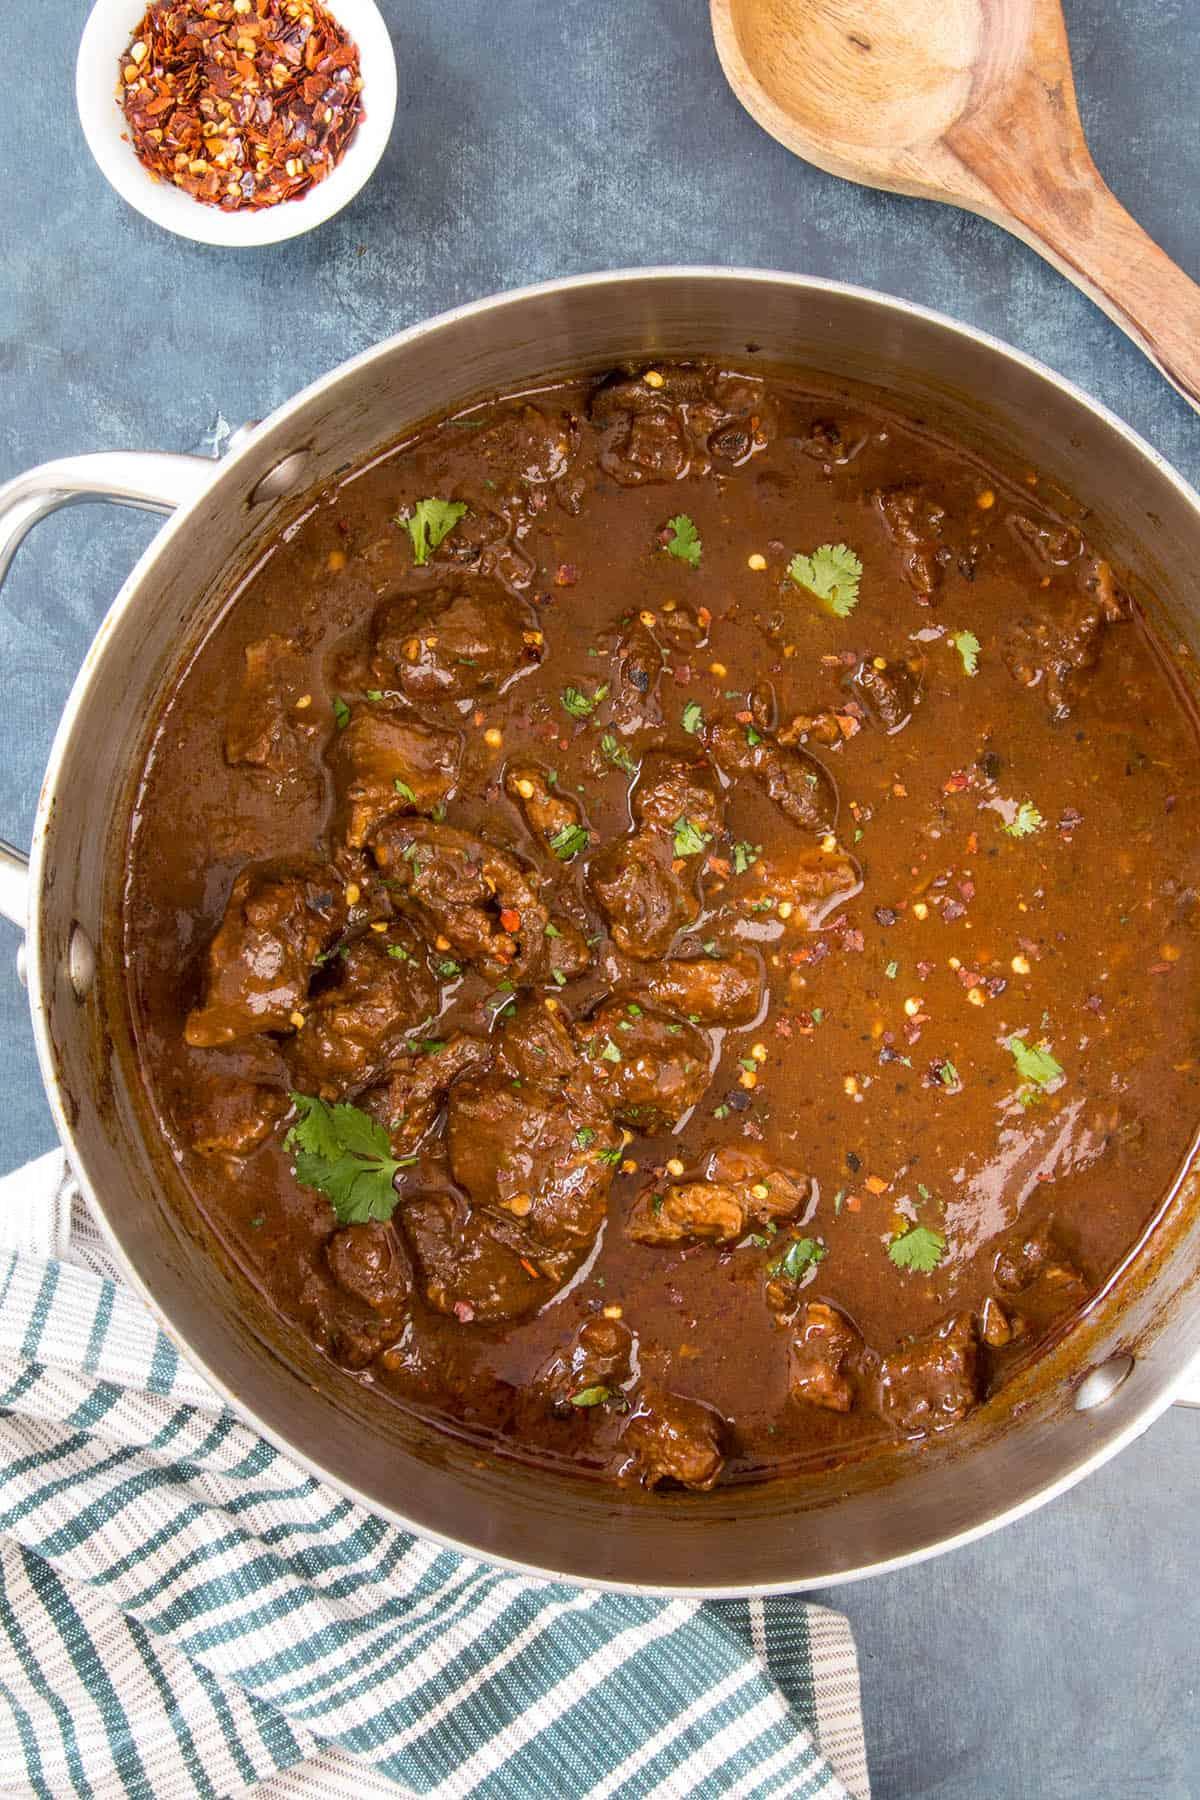 Chili Con Carne in a pot, ready to serve